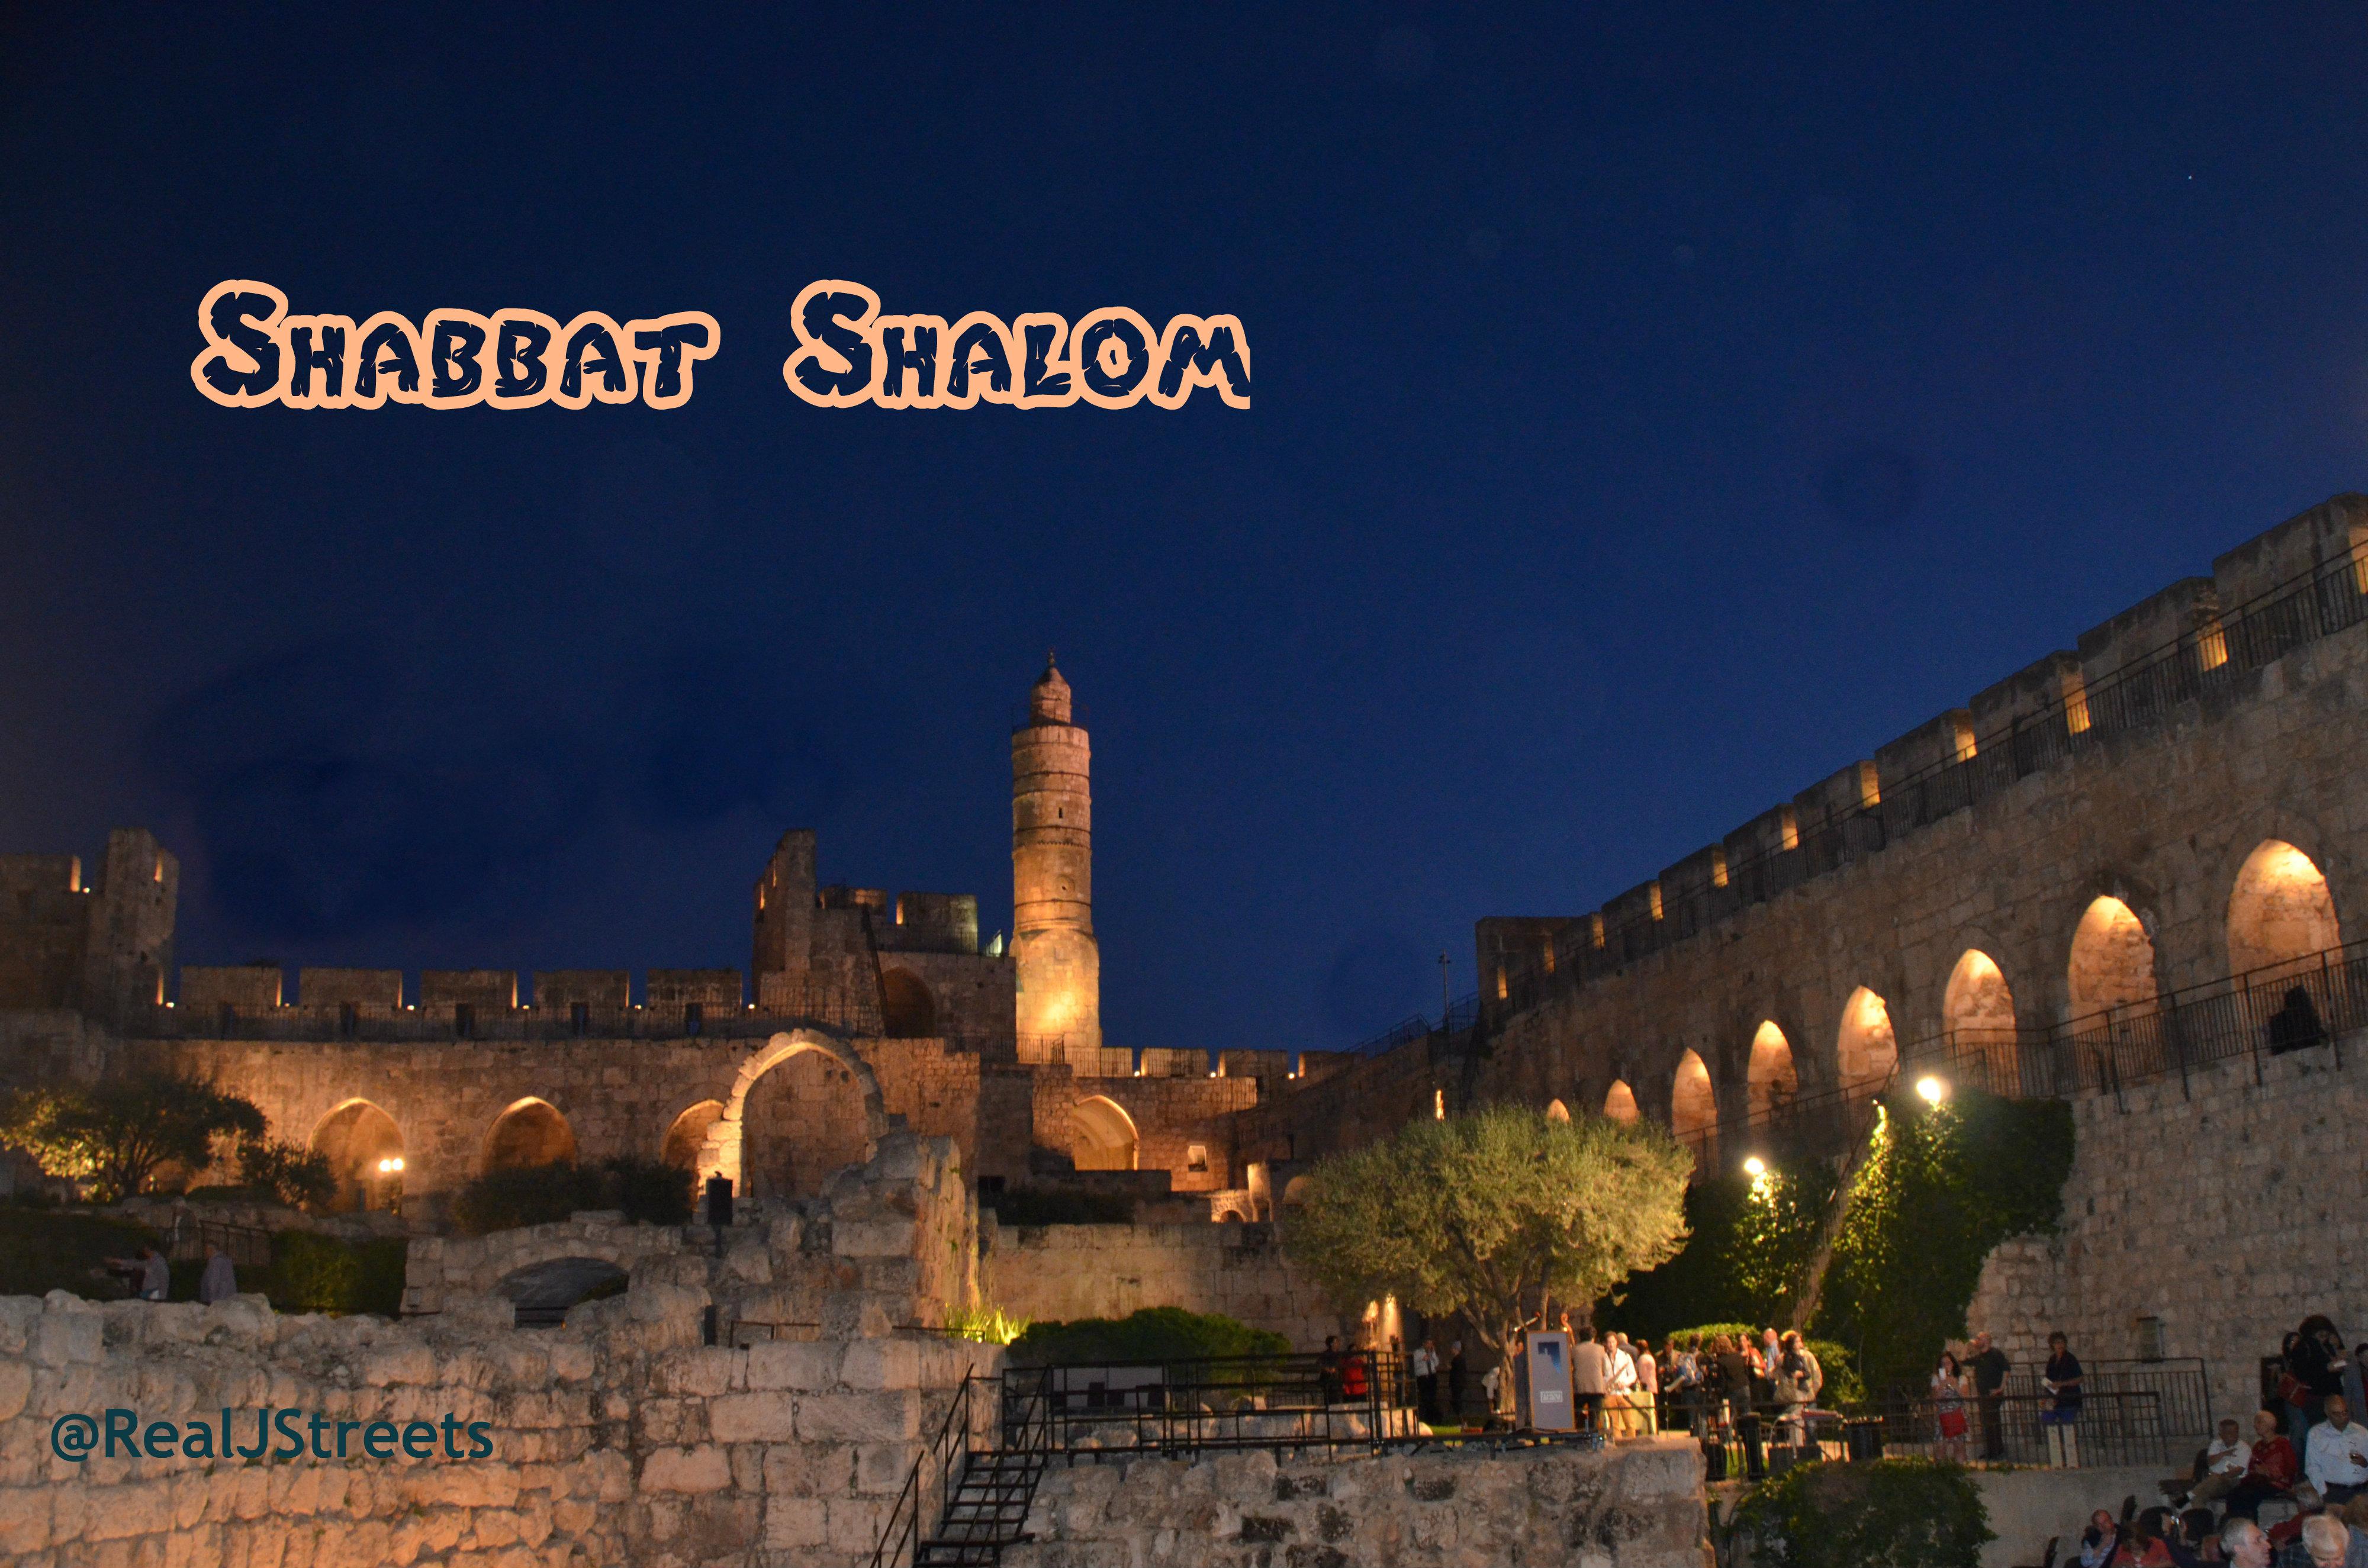 image Shabbat shalom, Photo Tower of David, picture Jerusalem at night